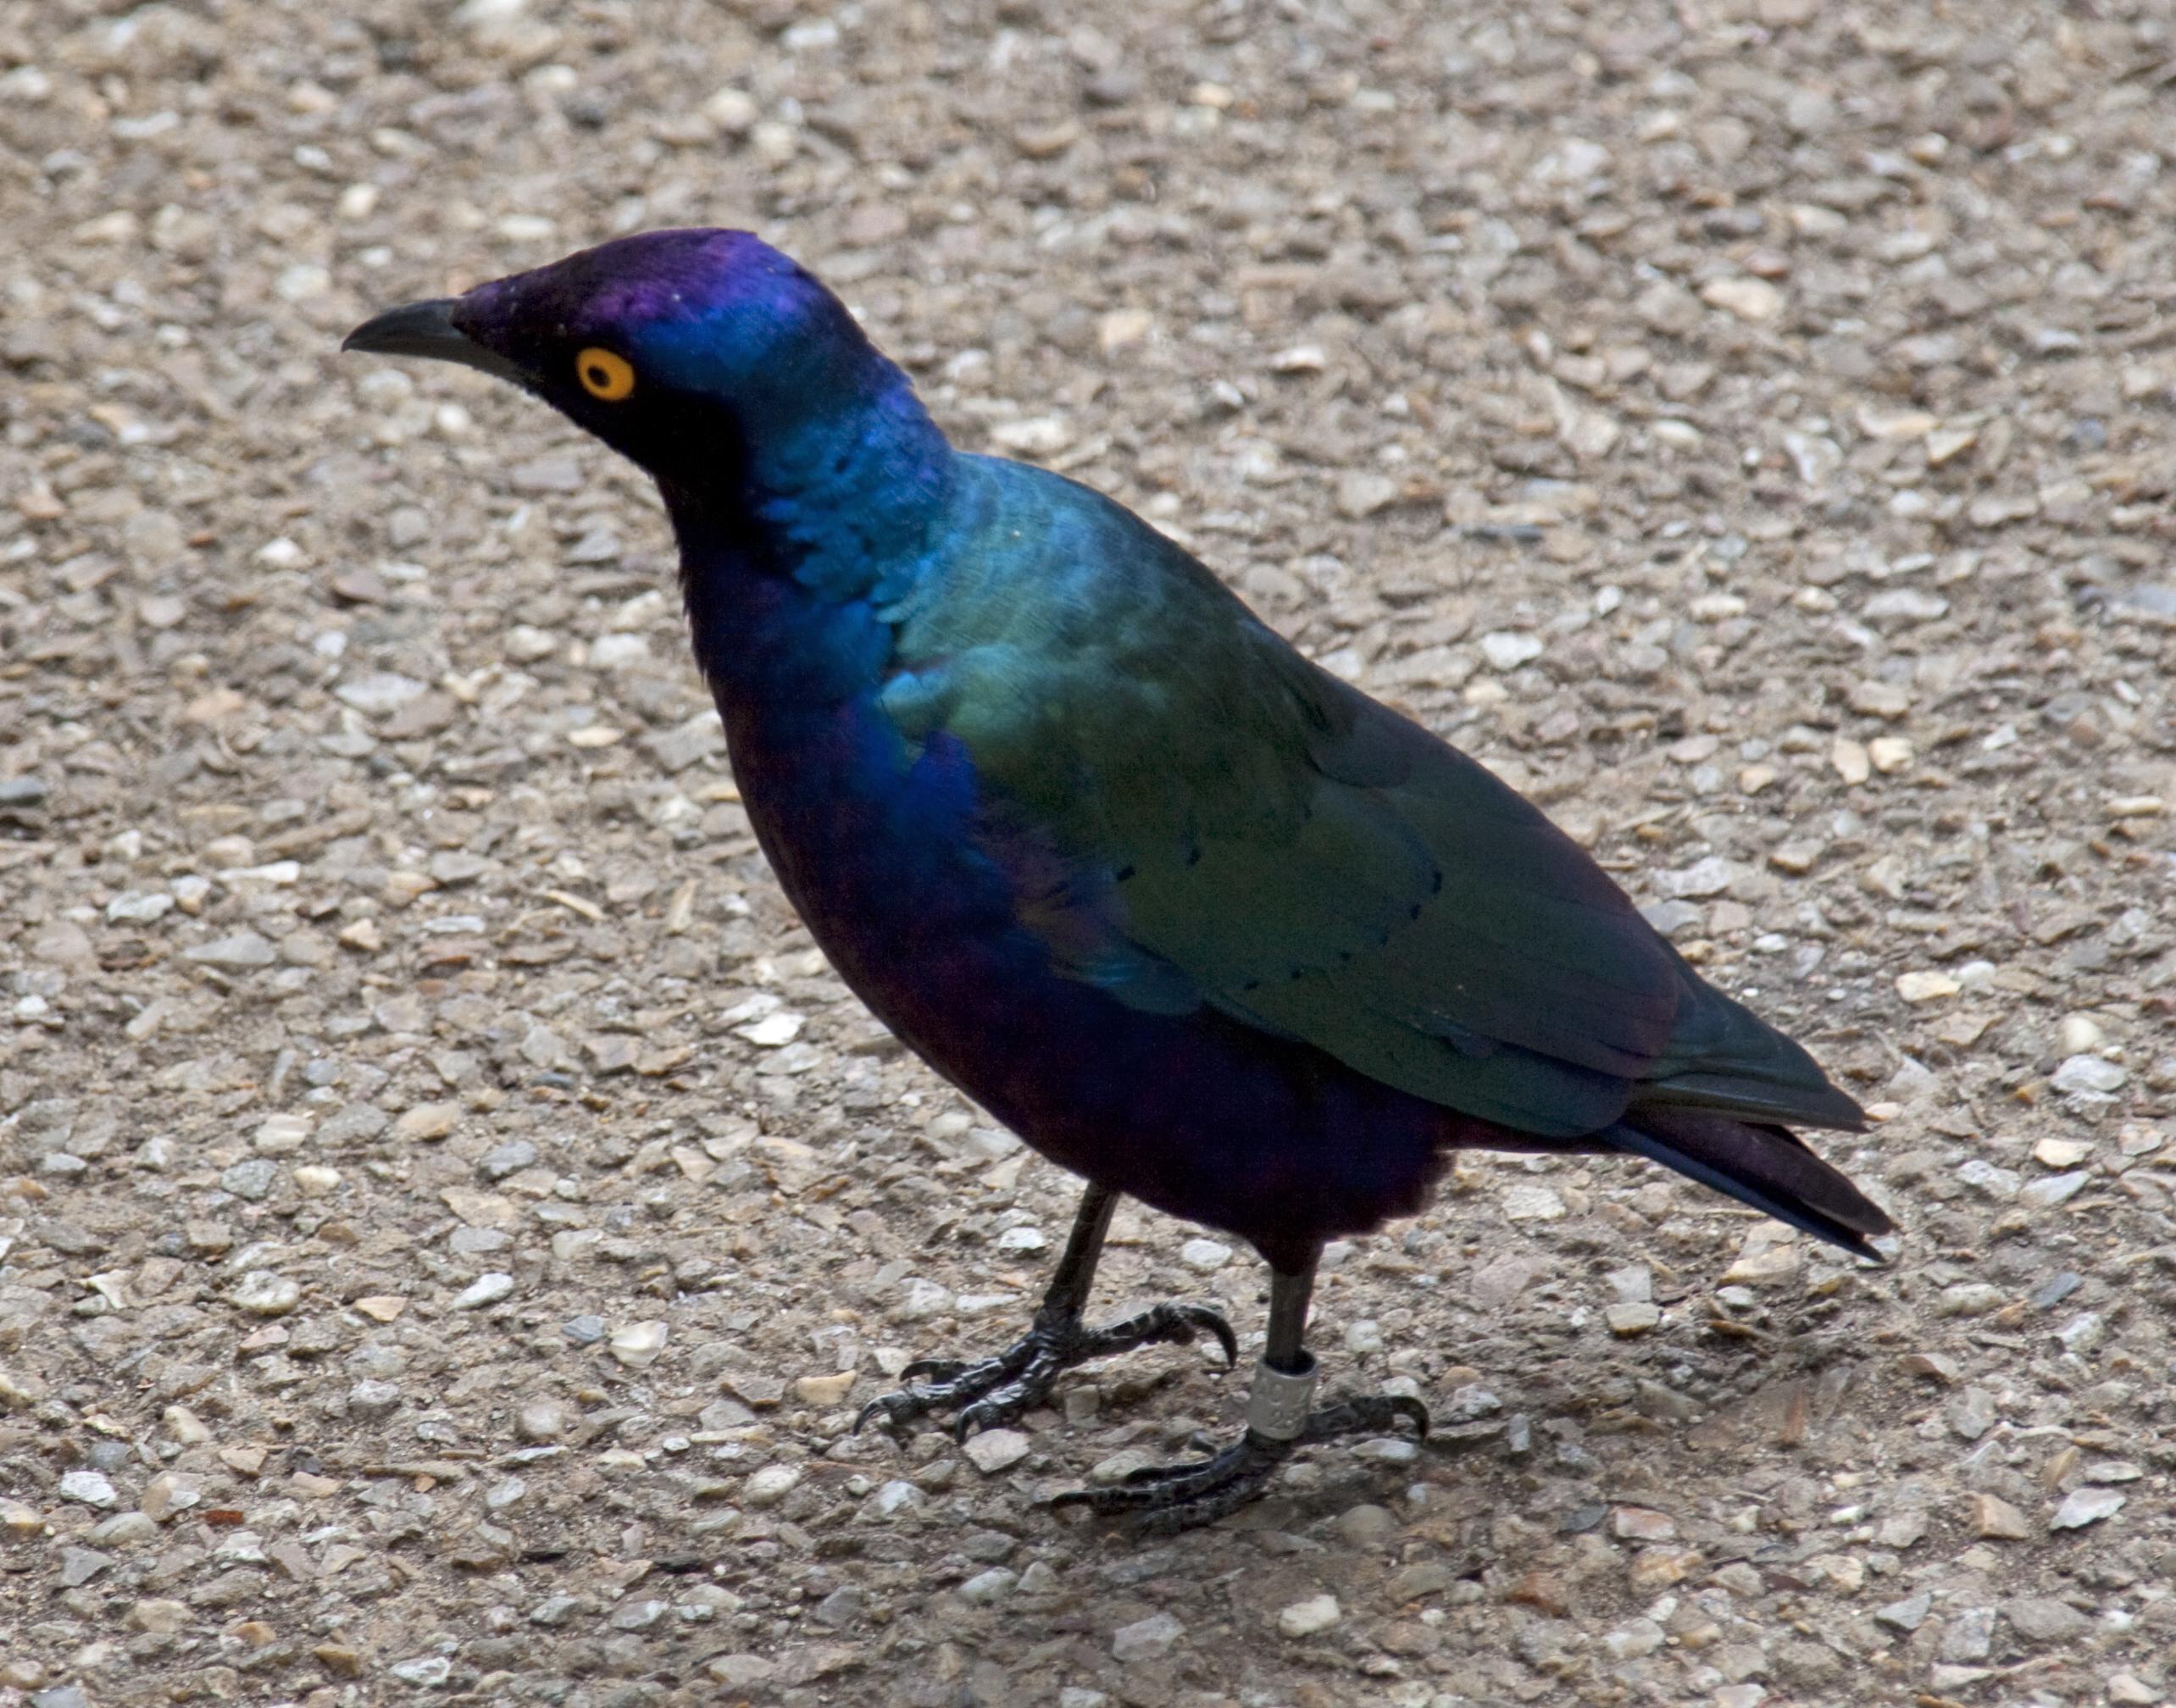 File Glossy Starling Blue And Purple Bird 3 4872087117 Jpg